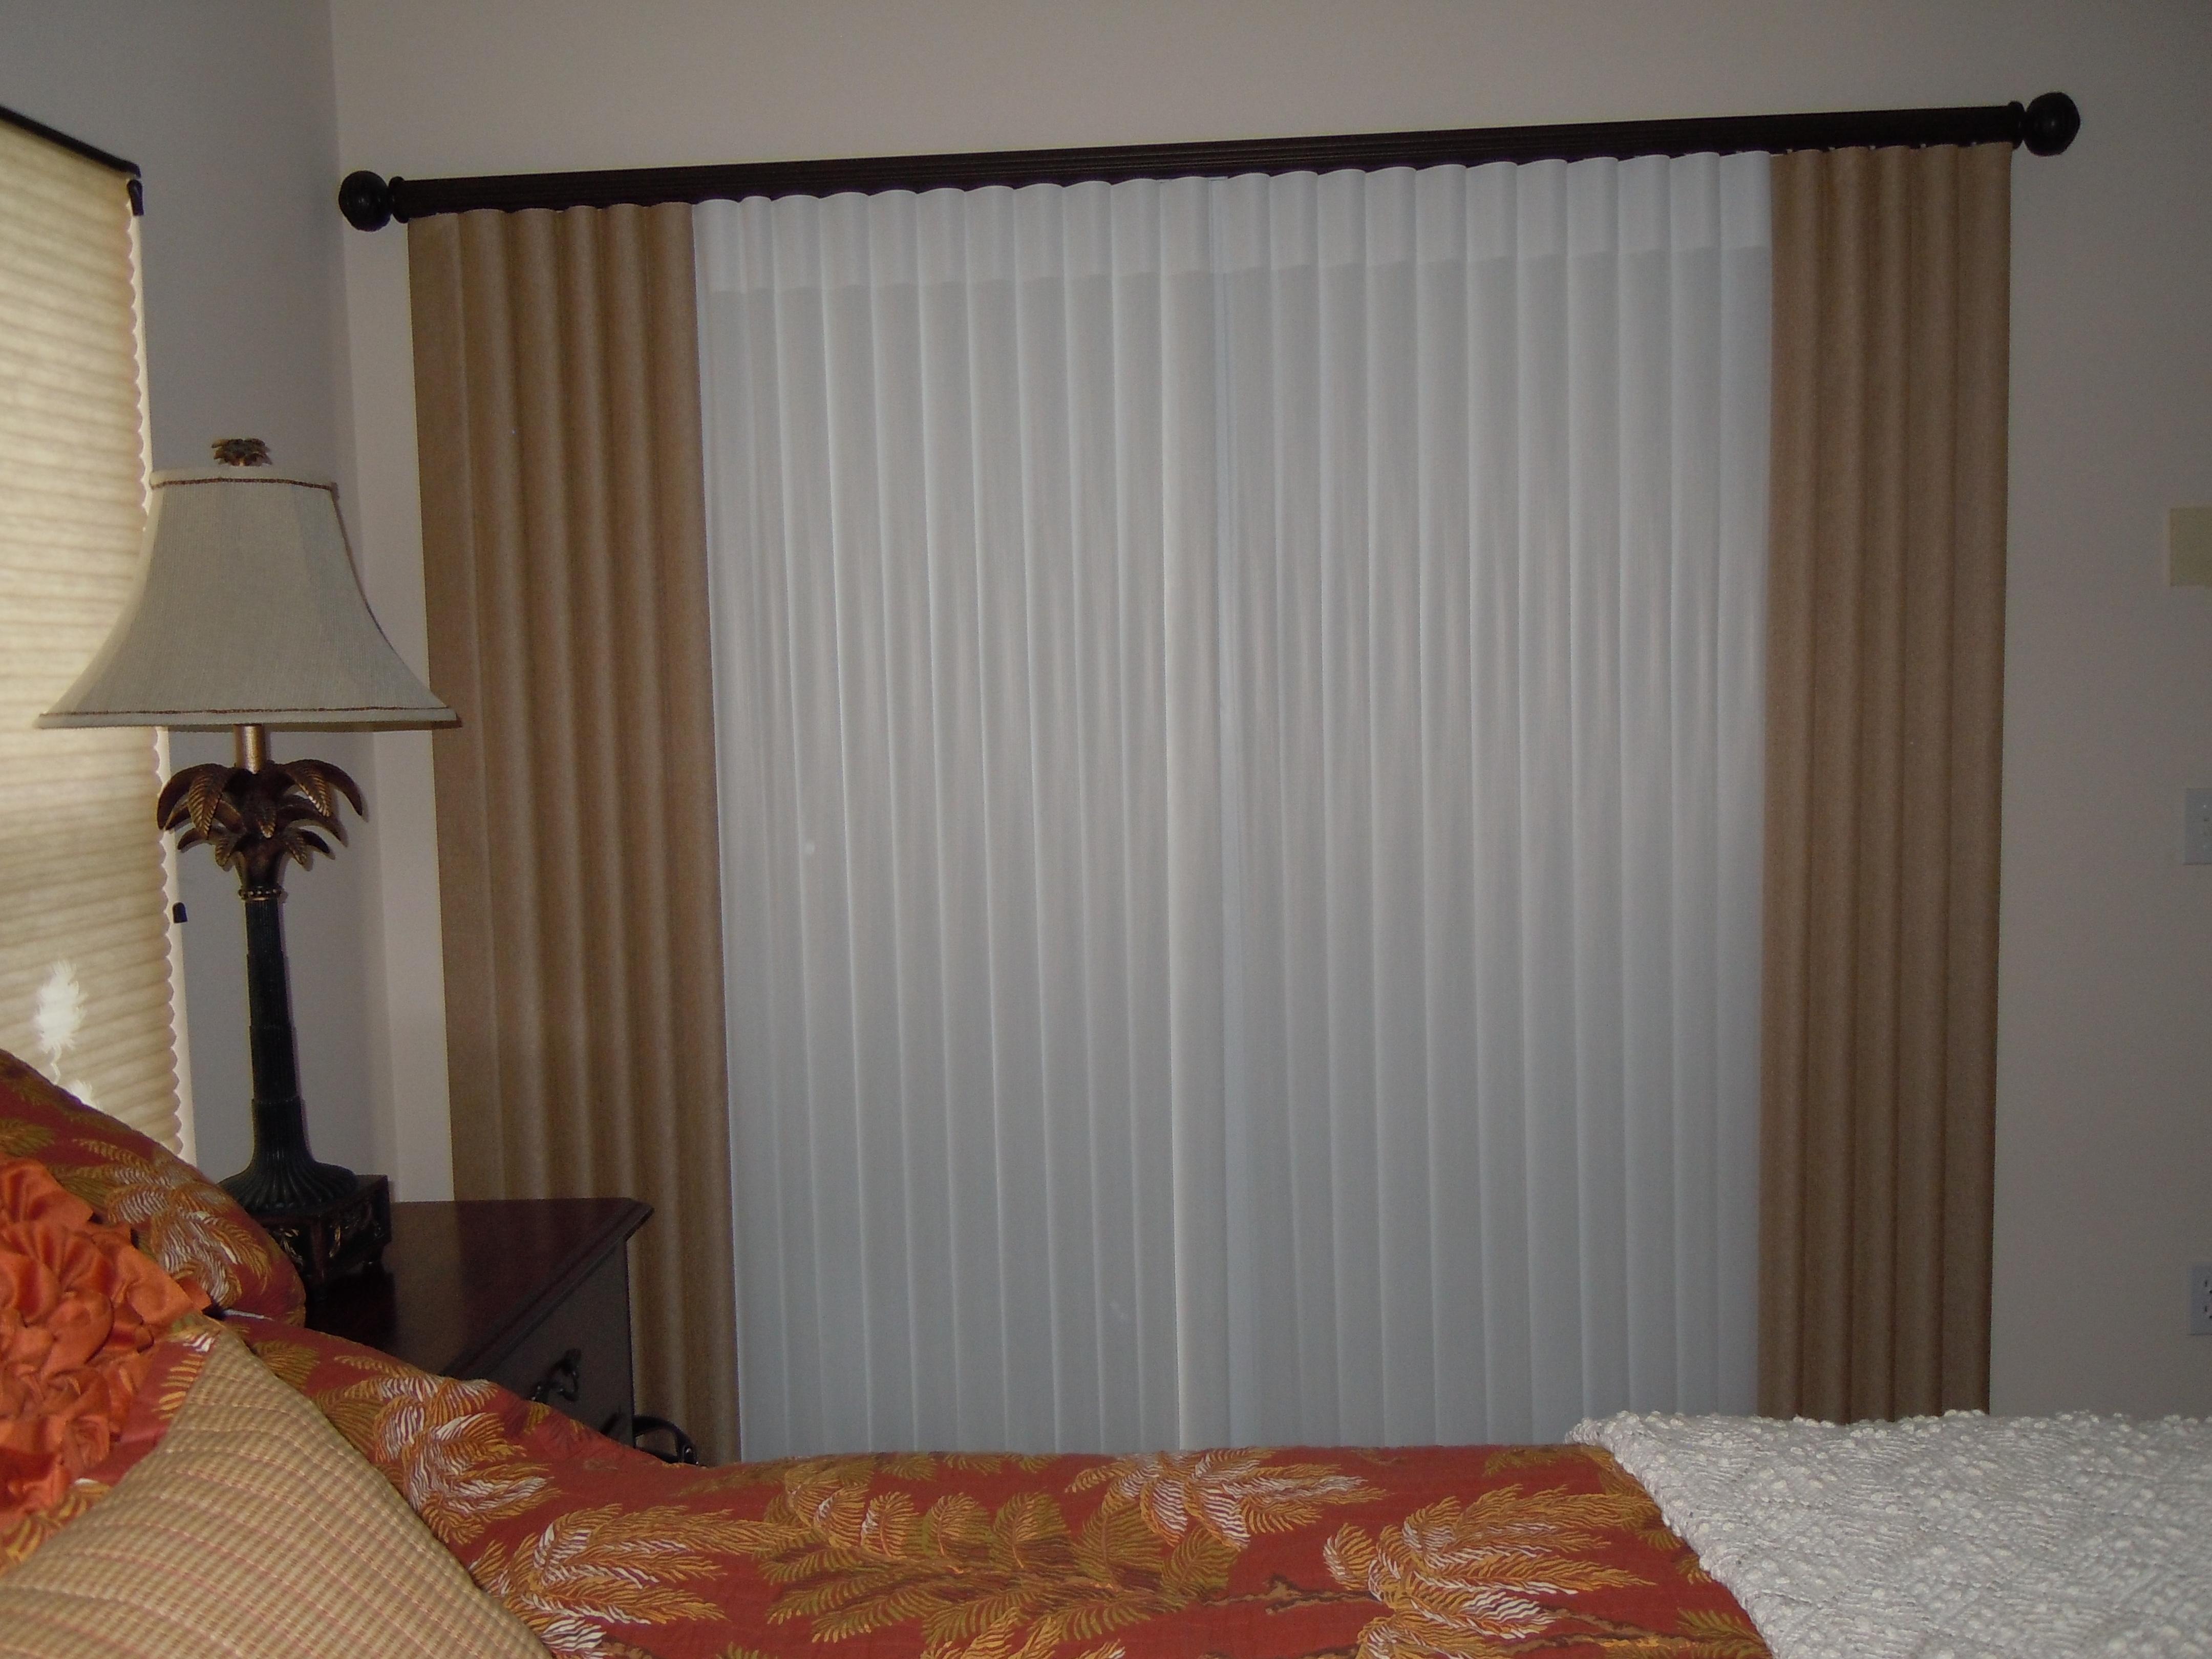 Vertical Blinds For Sliding Glass Door Inside Mount4320 X 3240